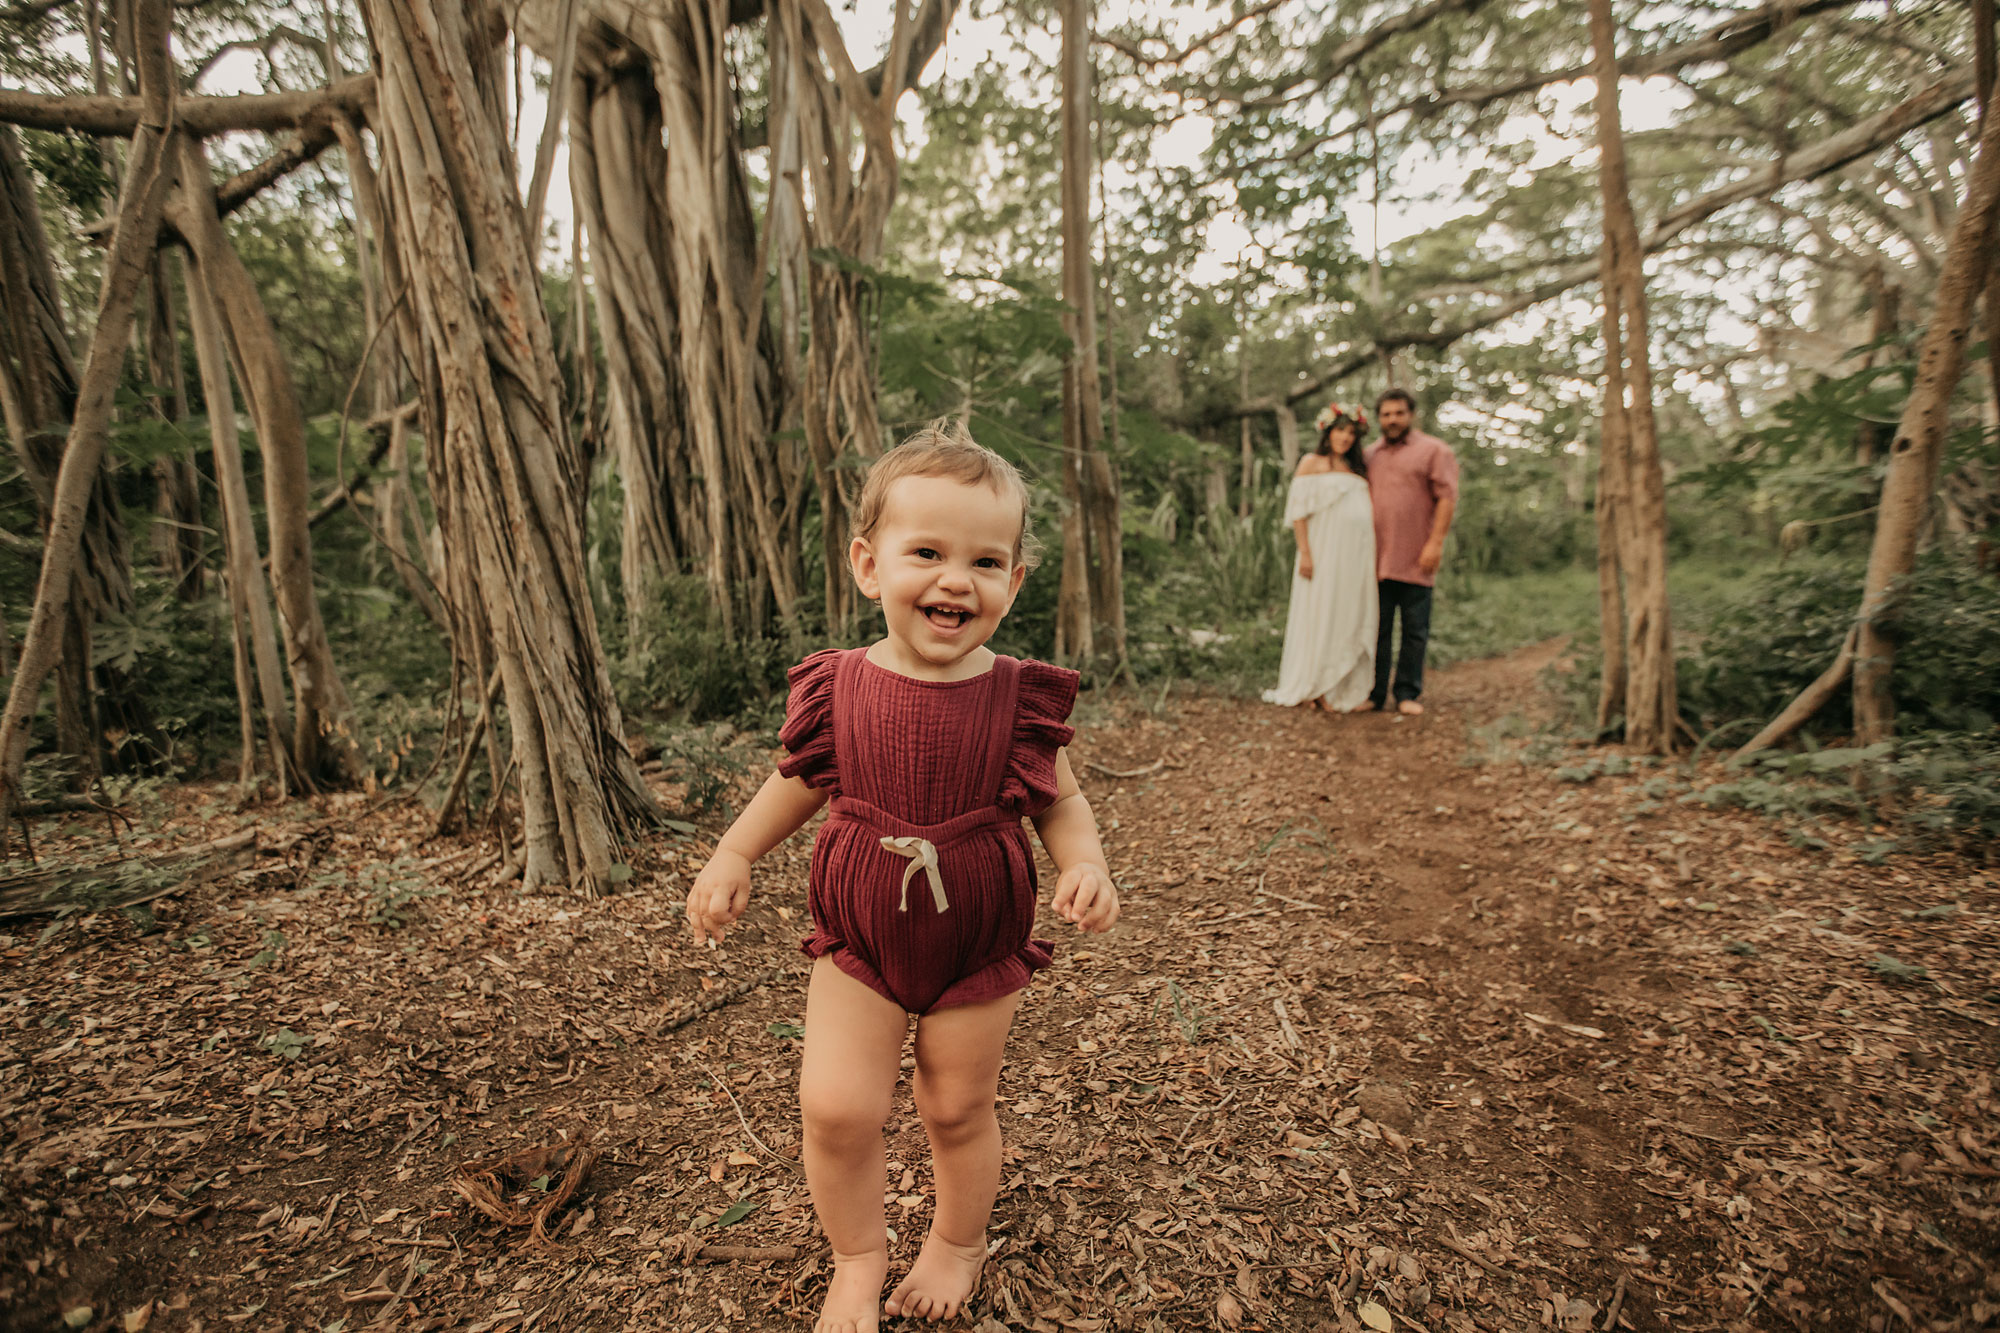 Hawaii-Oahu-Maternity-Photography-The-Sophia-Co-002.jpg